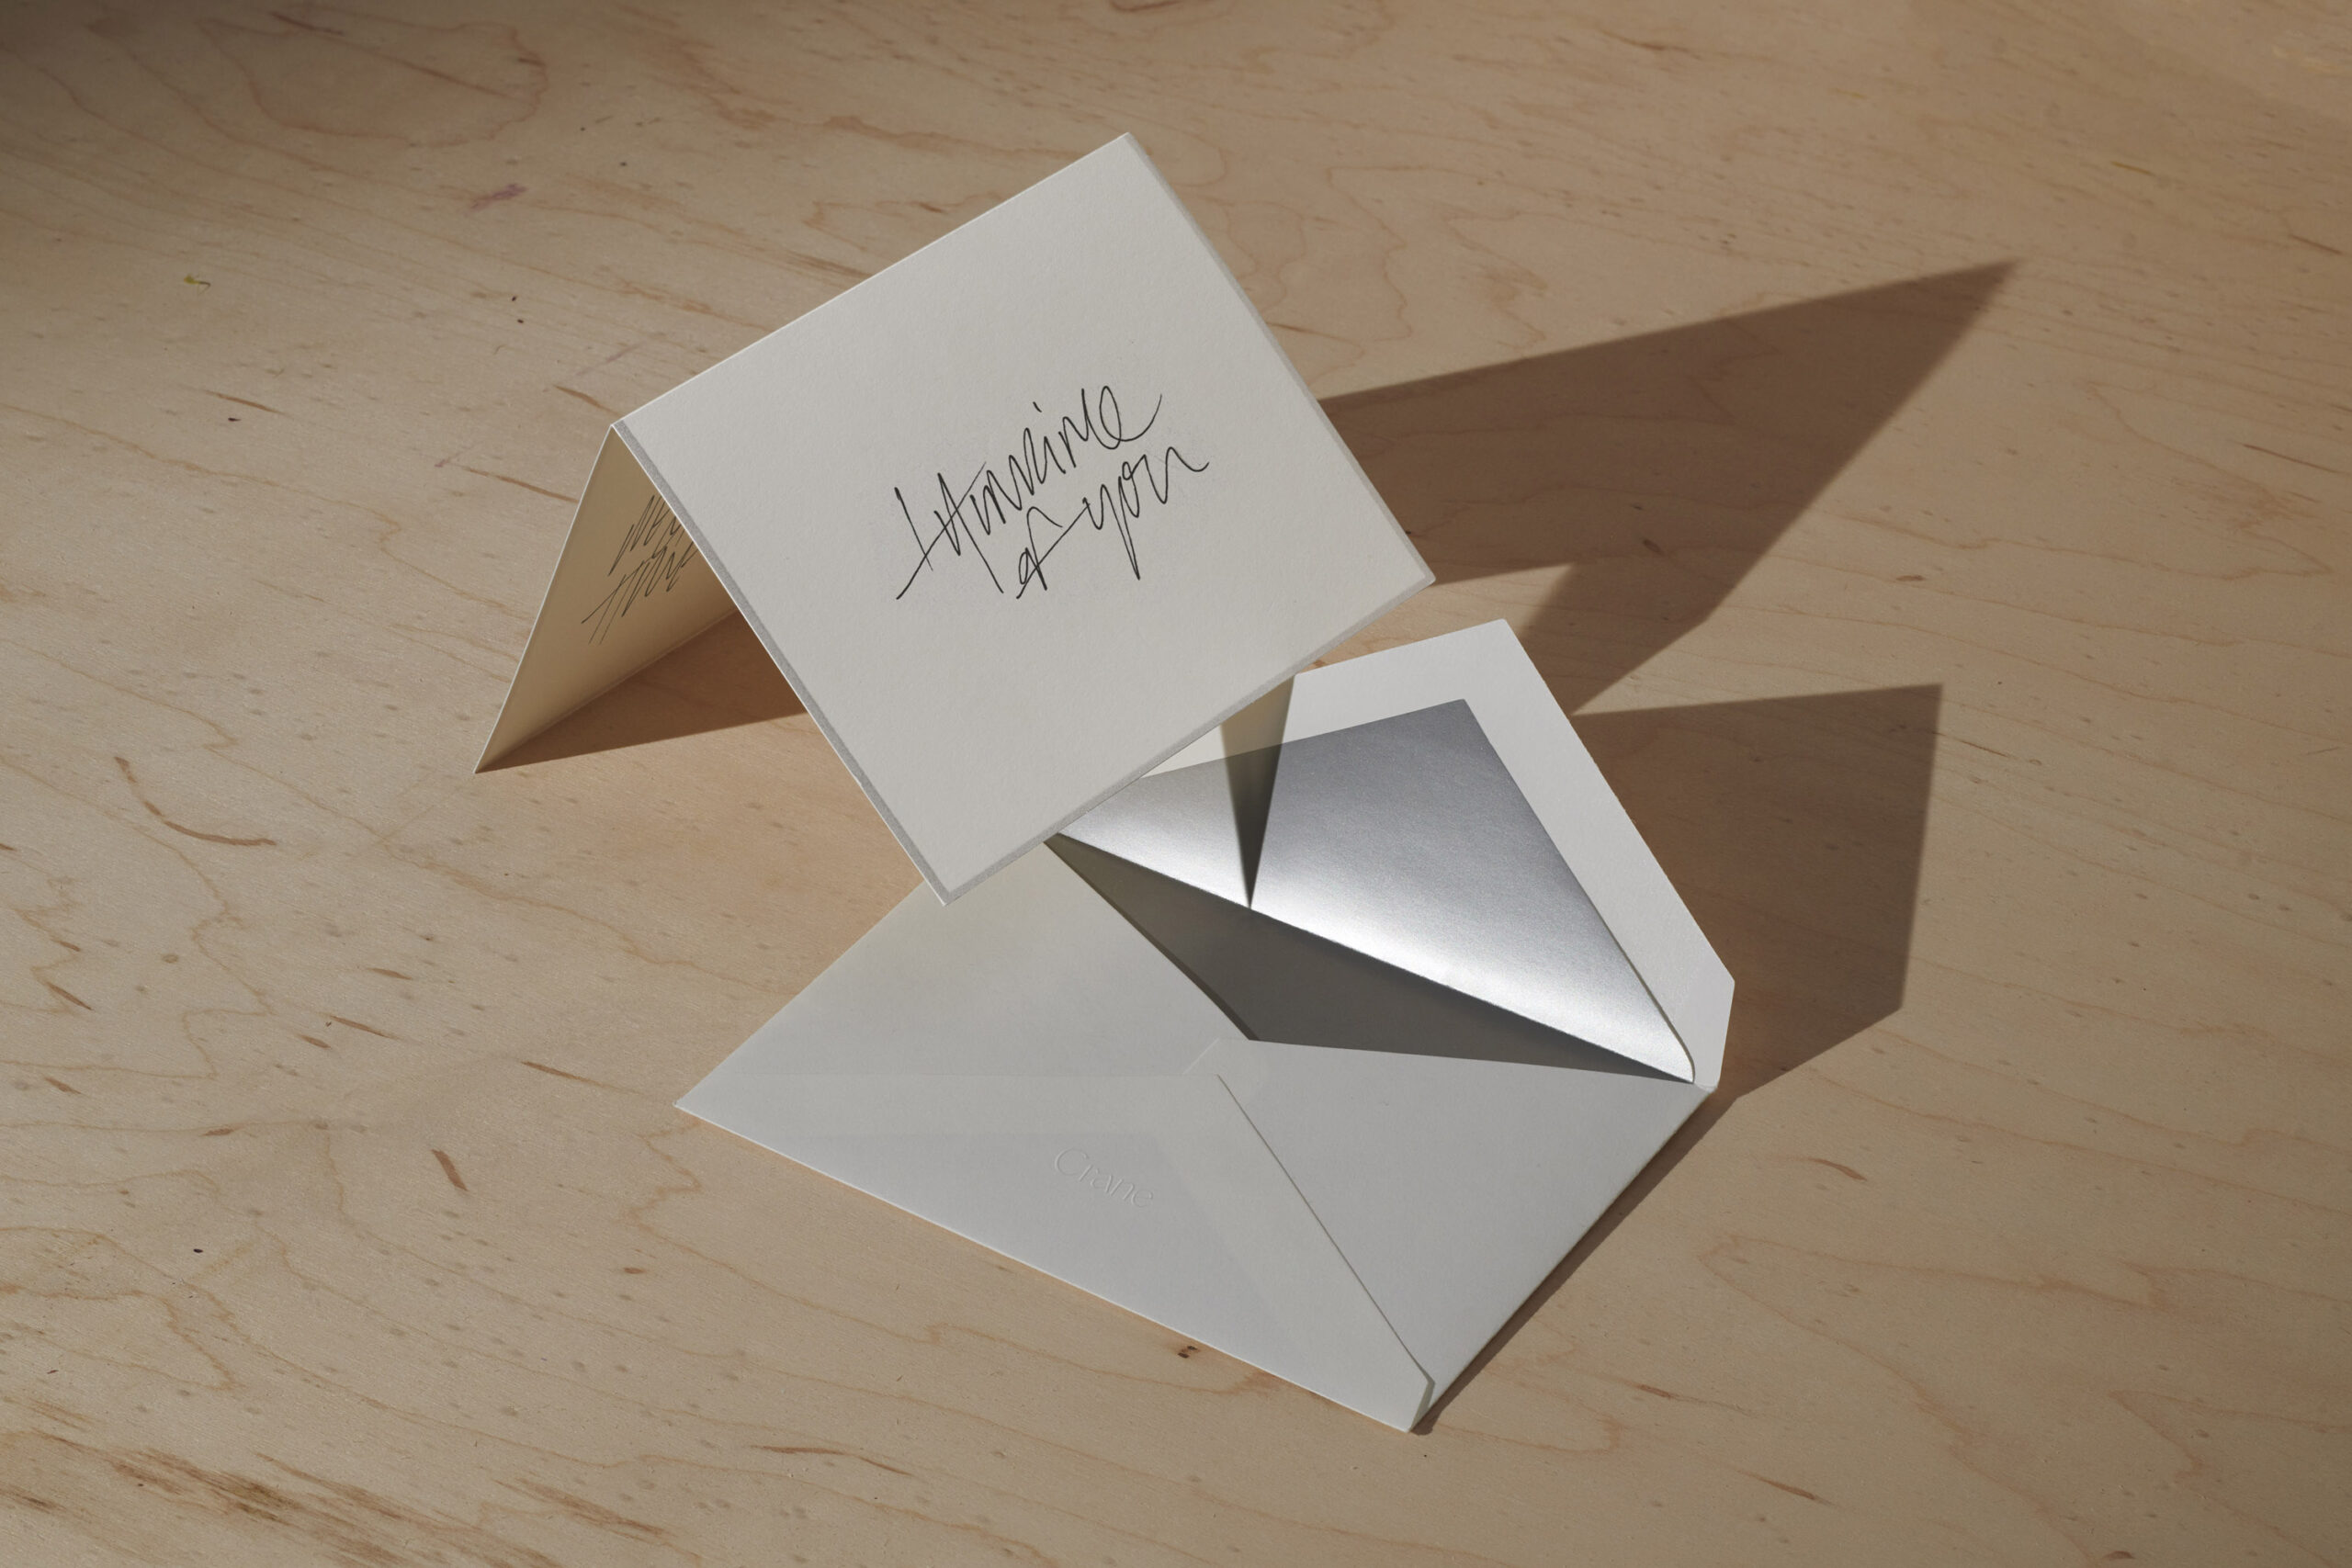 11-Crane-Envelope-Stacked